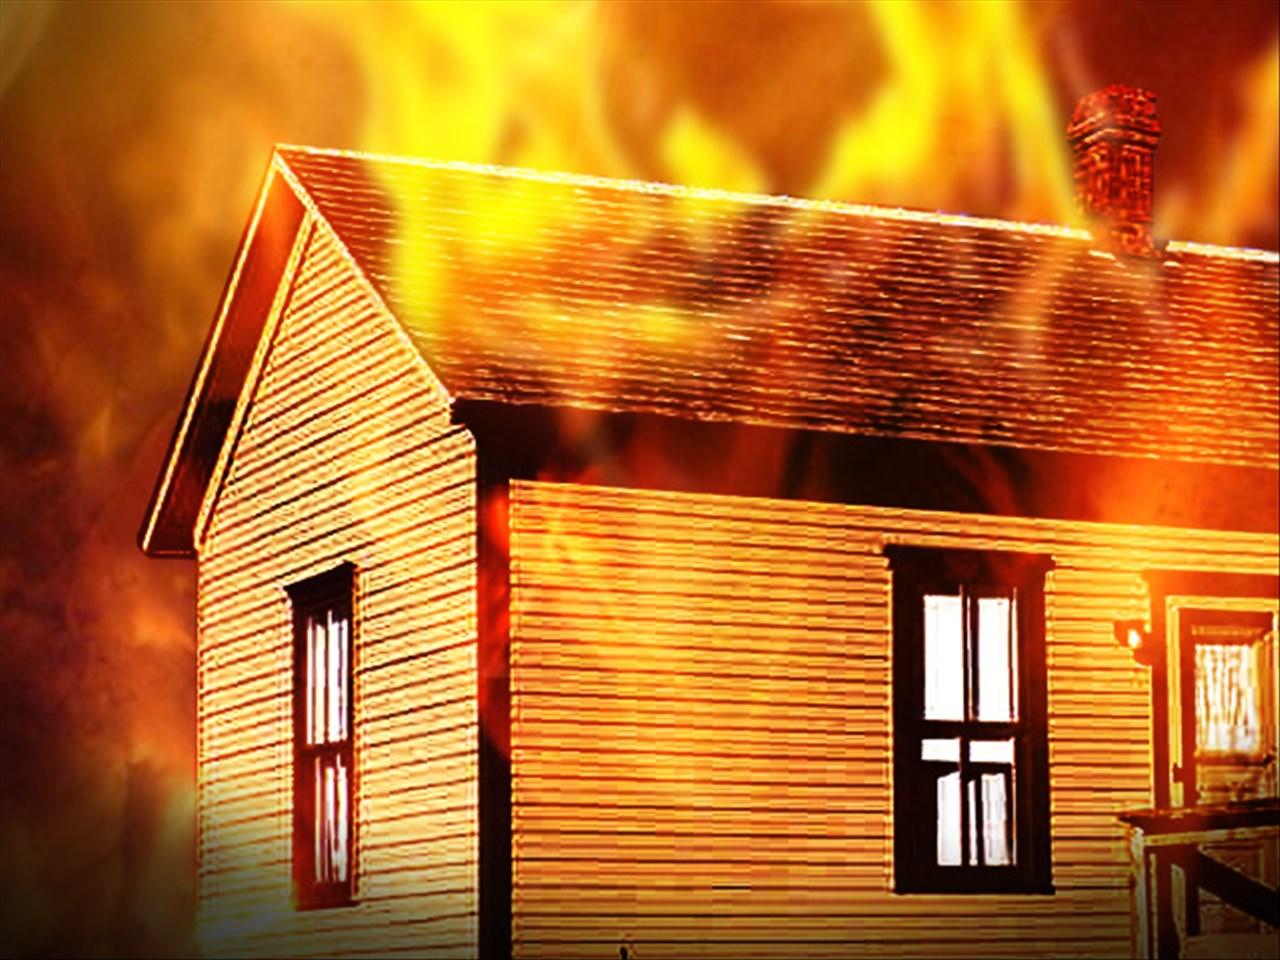 house fire image _1536372895209.jpg.jpg